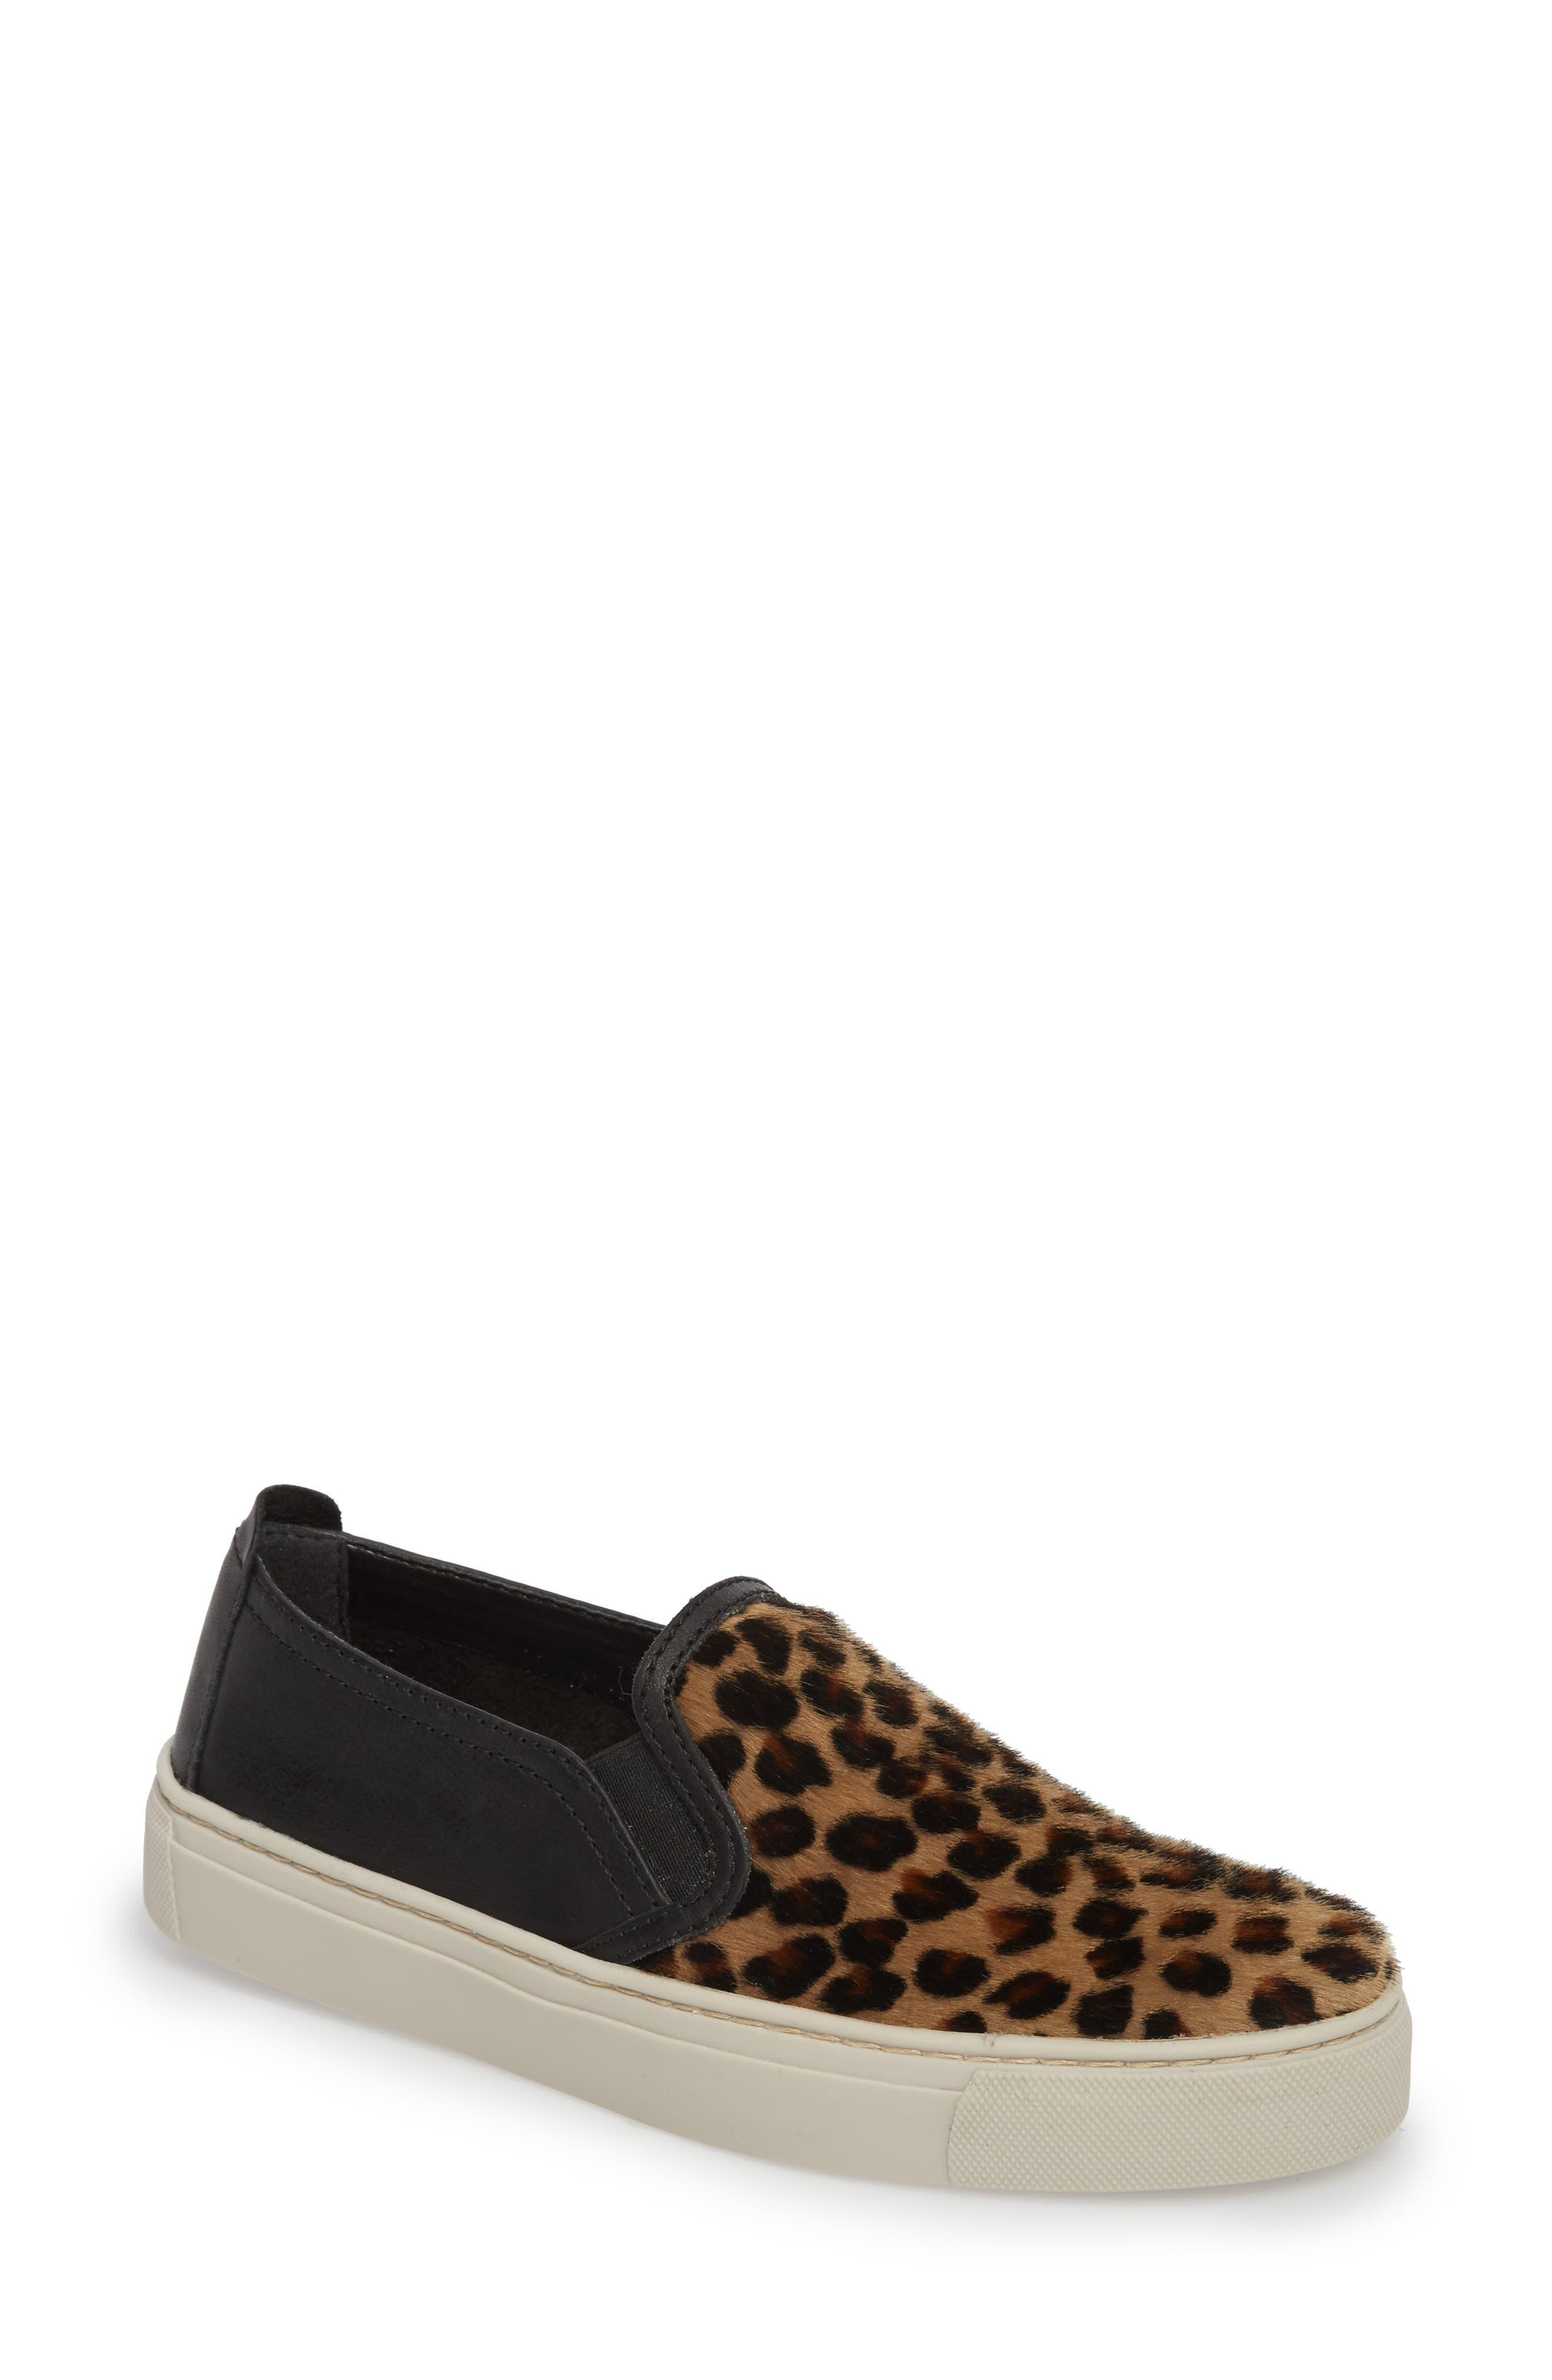 Sneak About Slip-On Sneaker,                         Main,                         color, Jaguar Black Leather